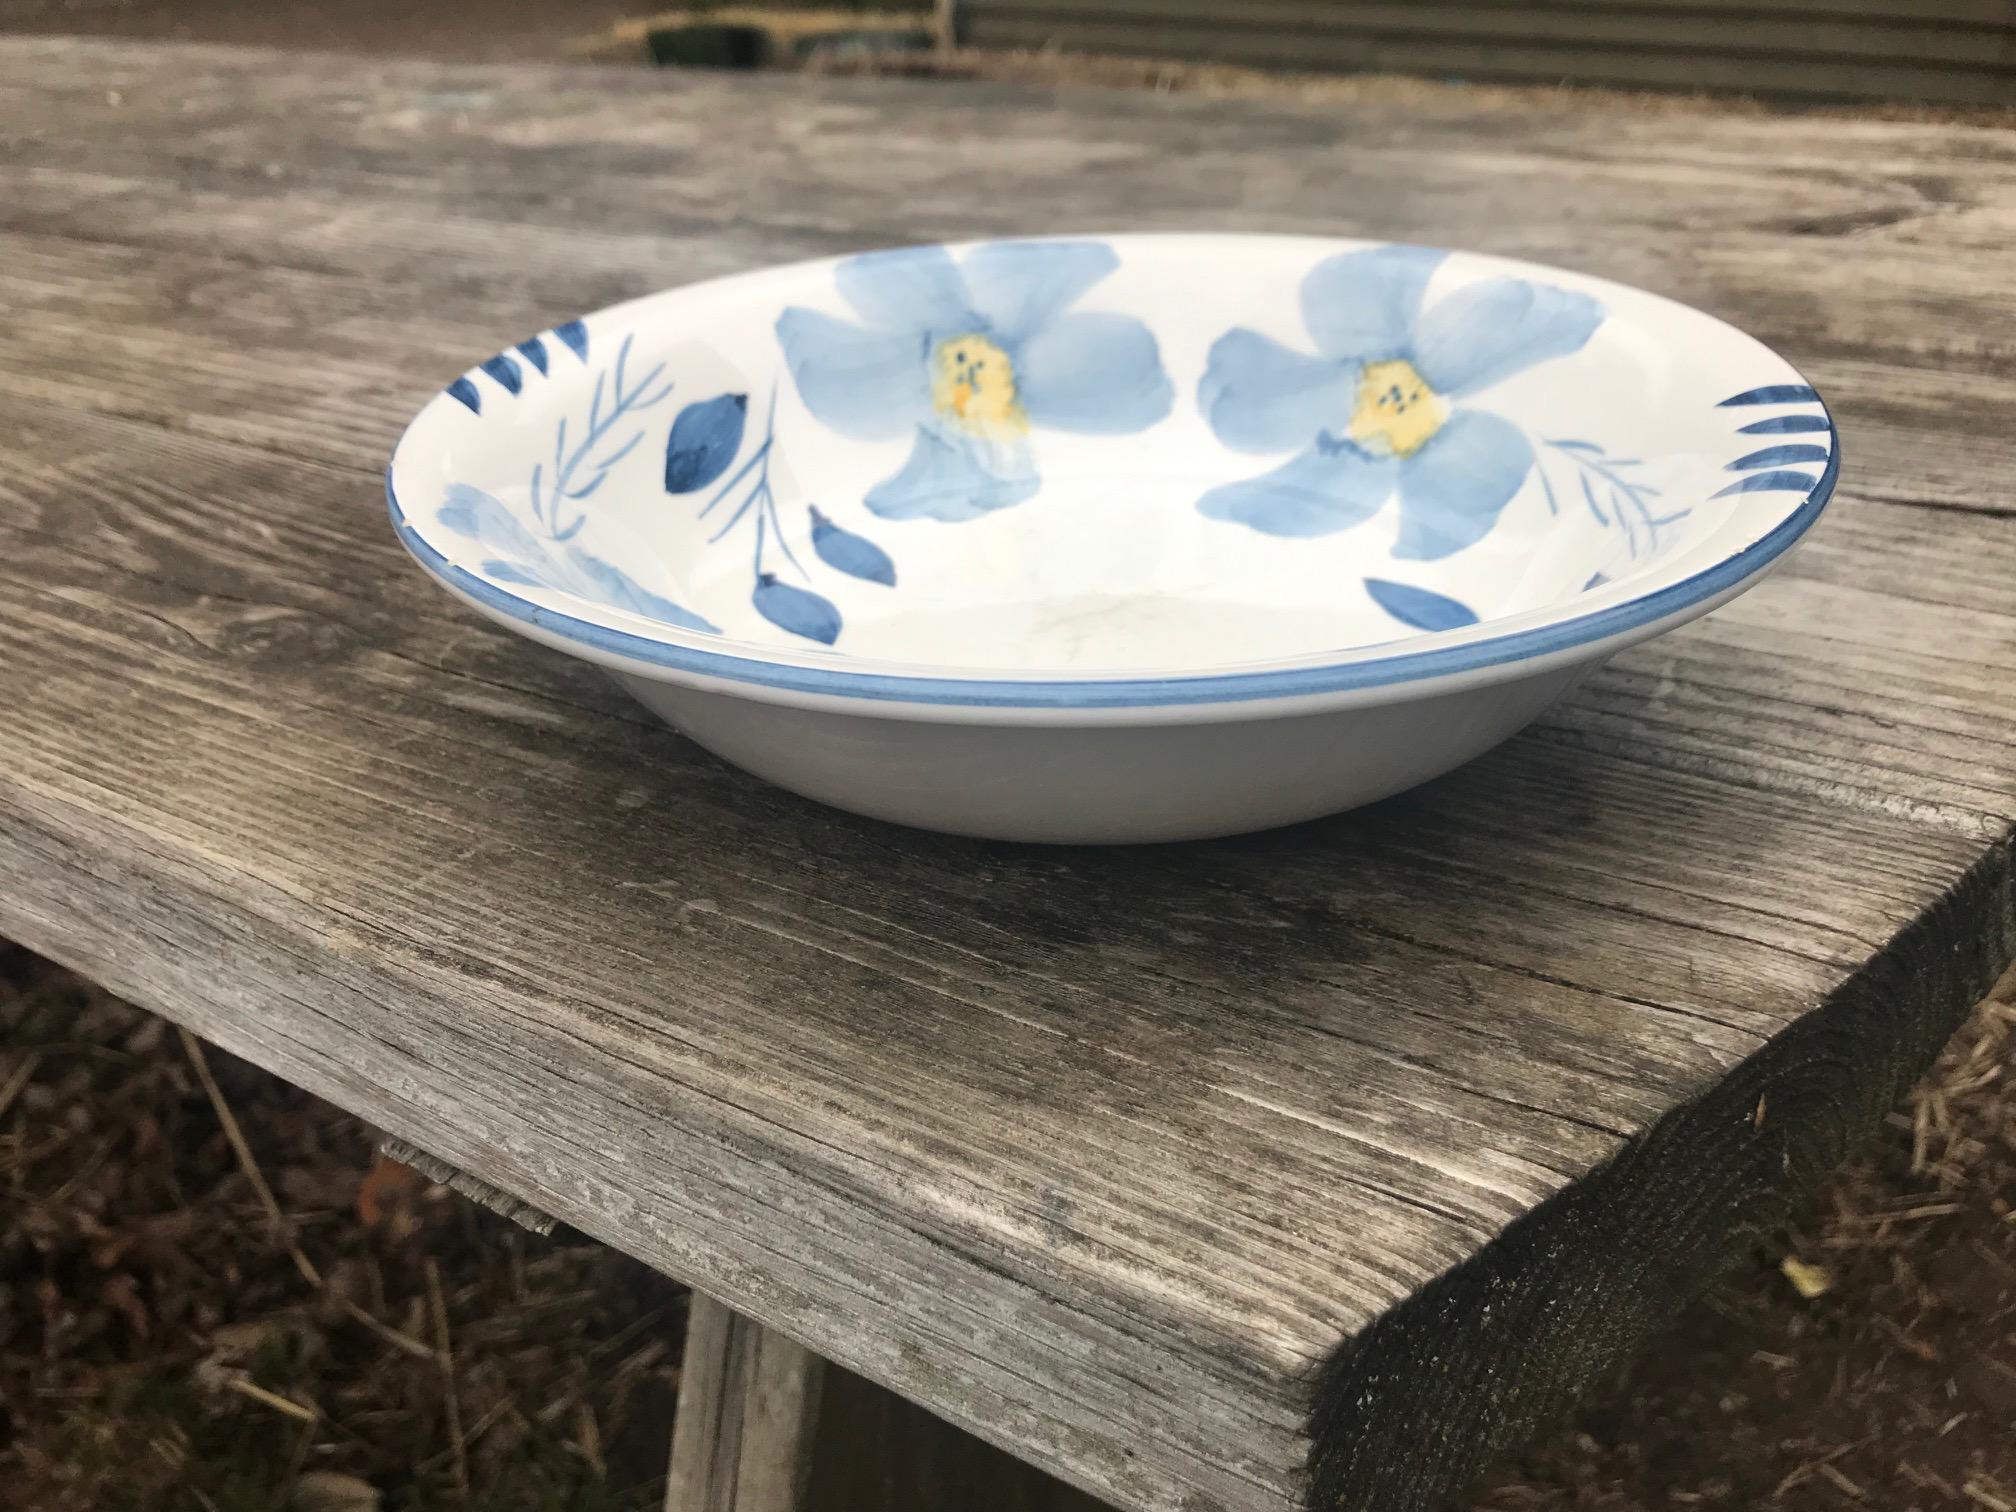 Dollar Store c. 1999 Blue & White Floral Pattern Ceramic Bowl (No Maker's Mark): 70,200 +/- 2,400 ppm Lead